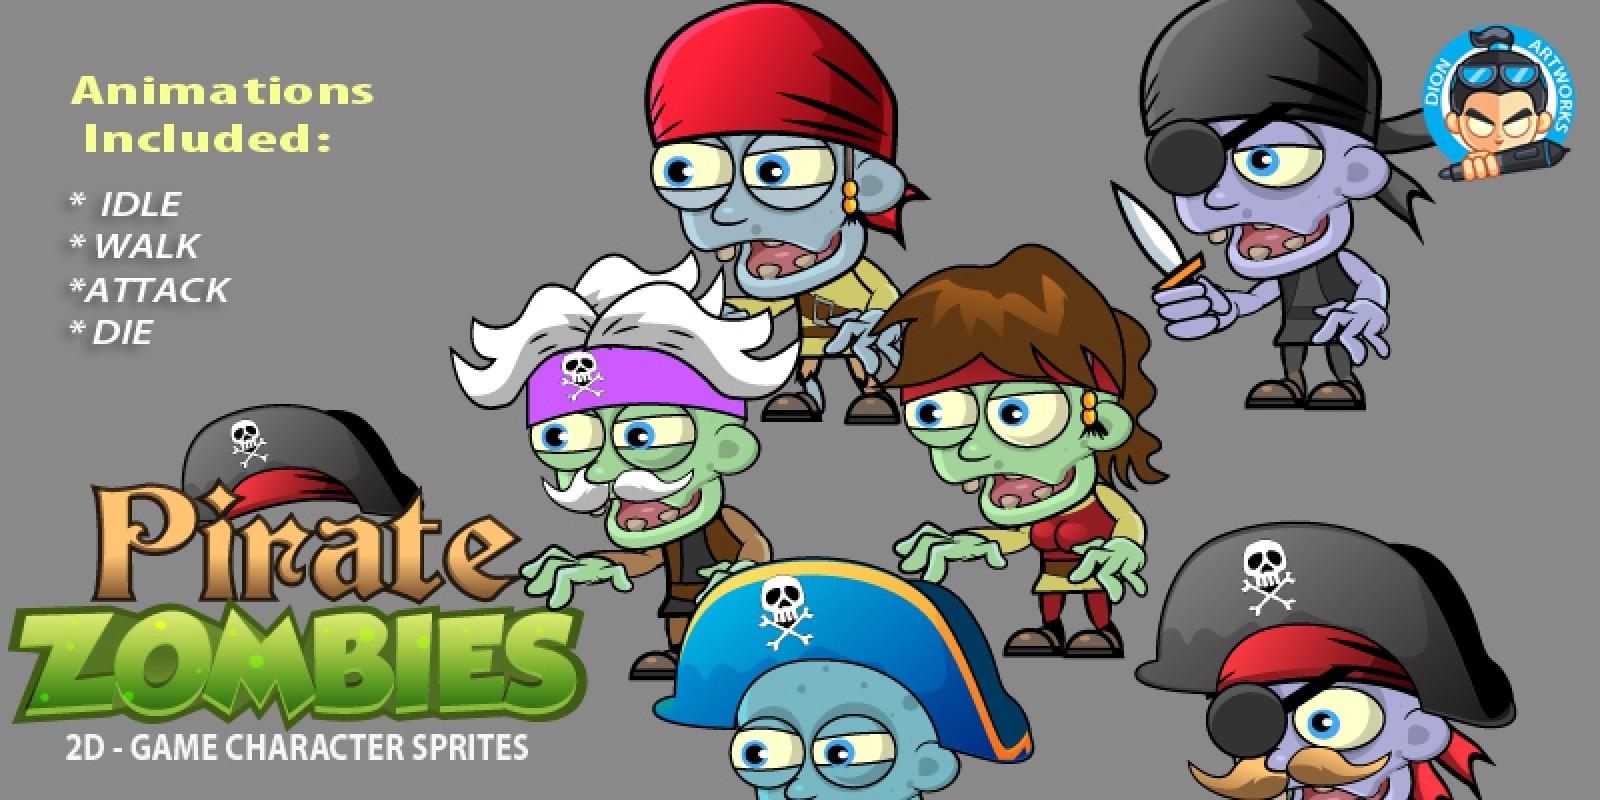 6- Pirates Zombie Character Sprites Set